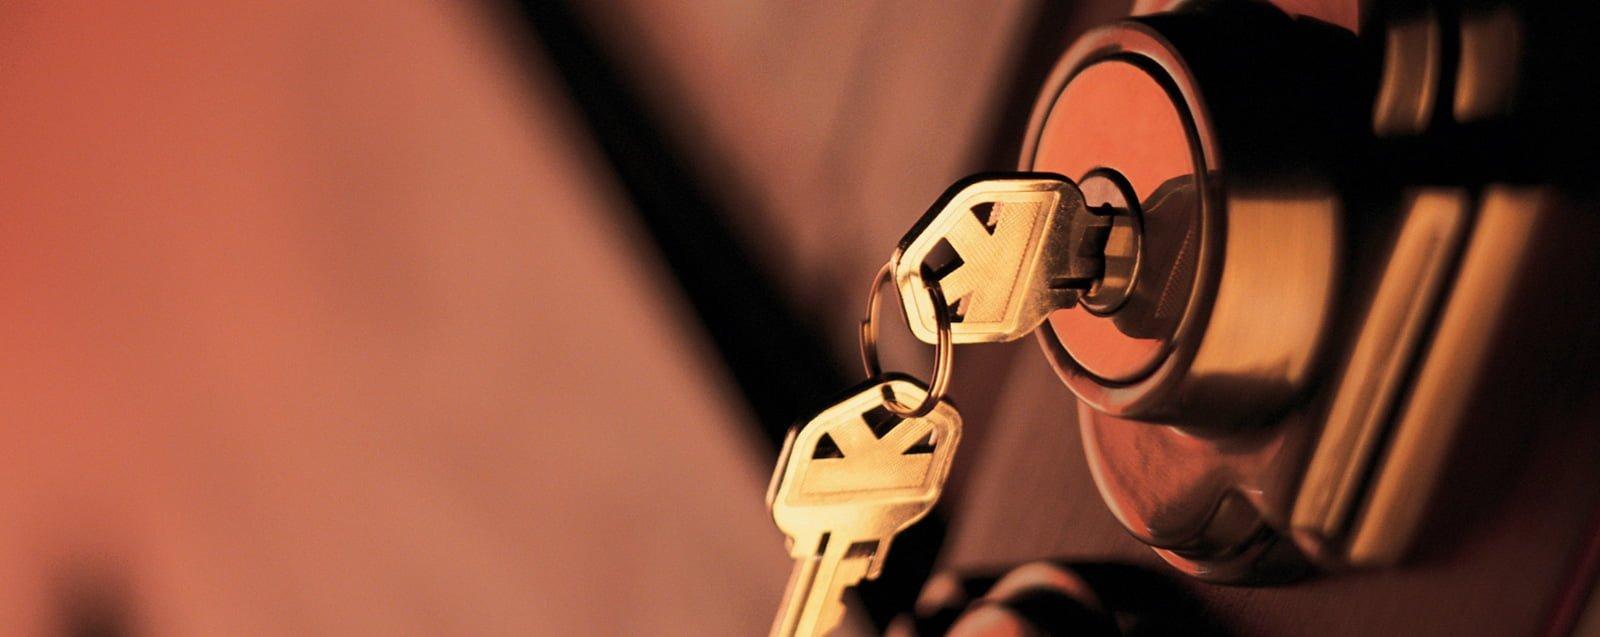 Professional Mobile Locksmith